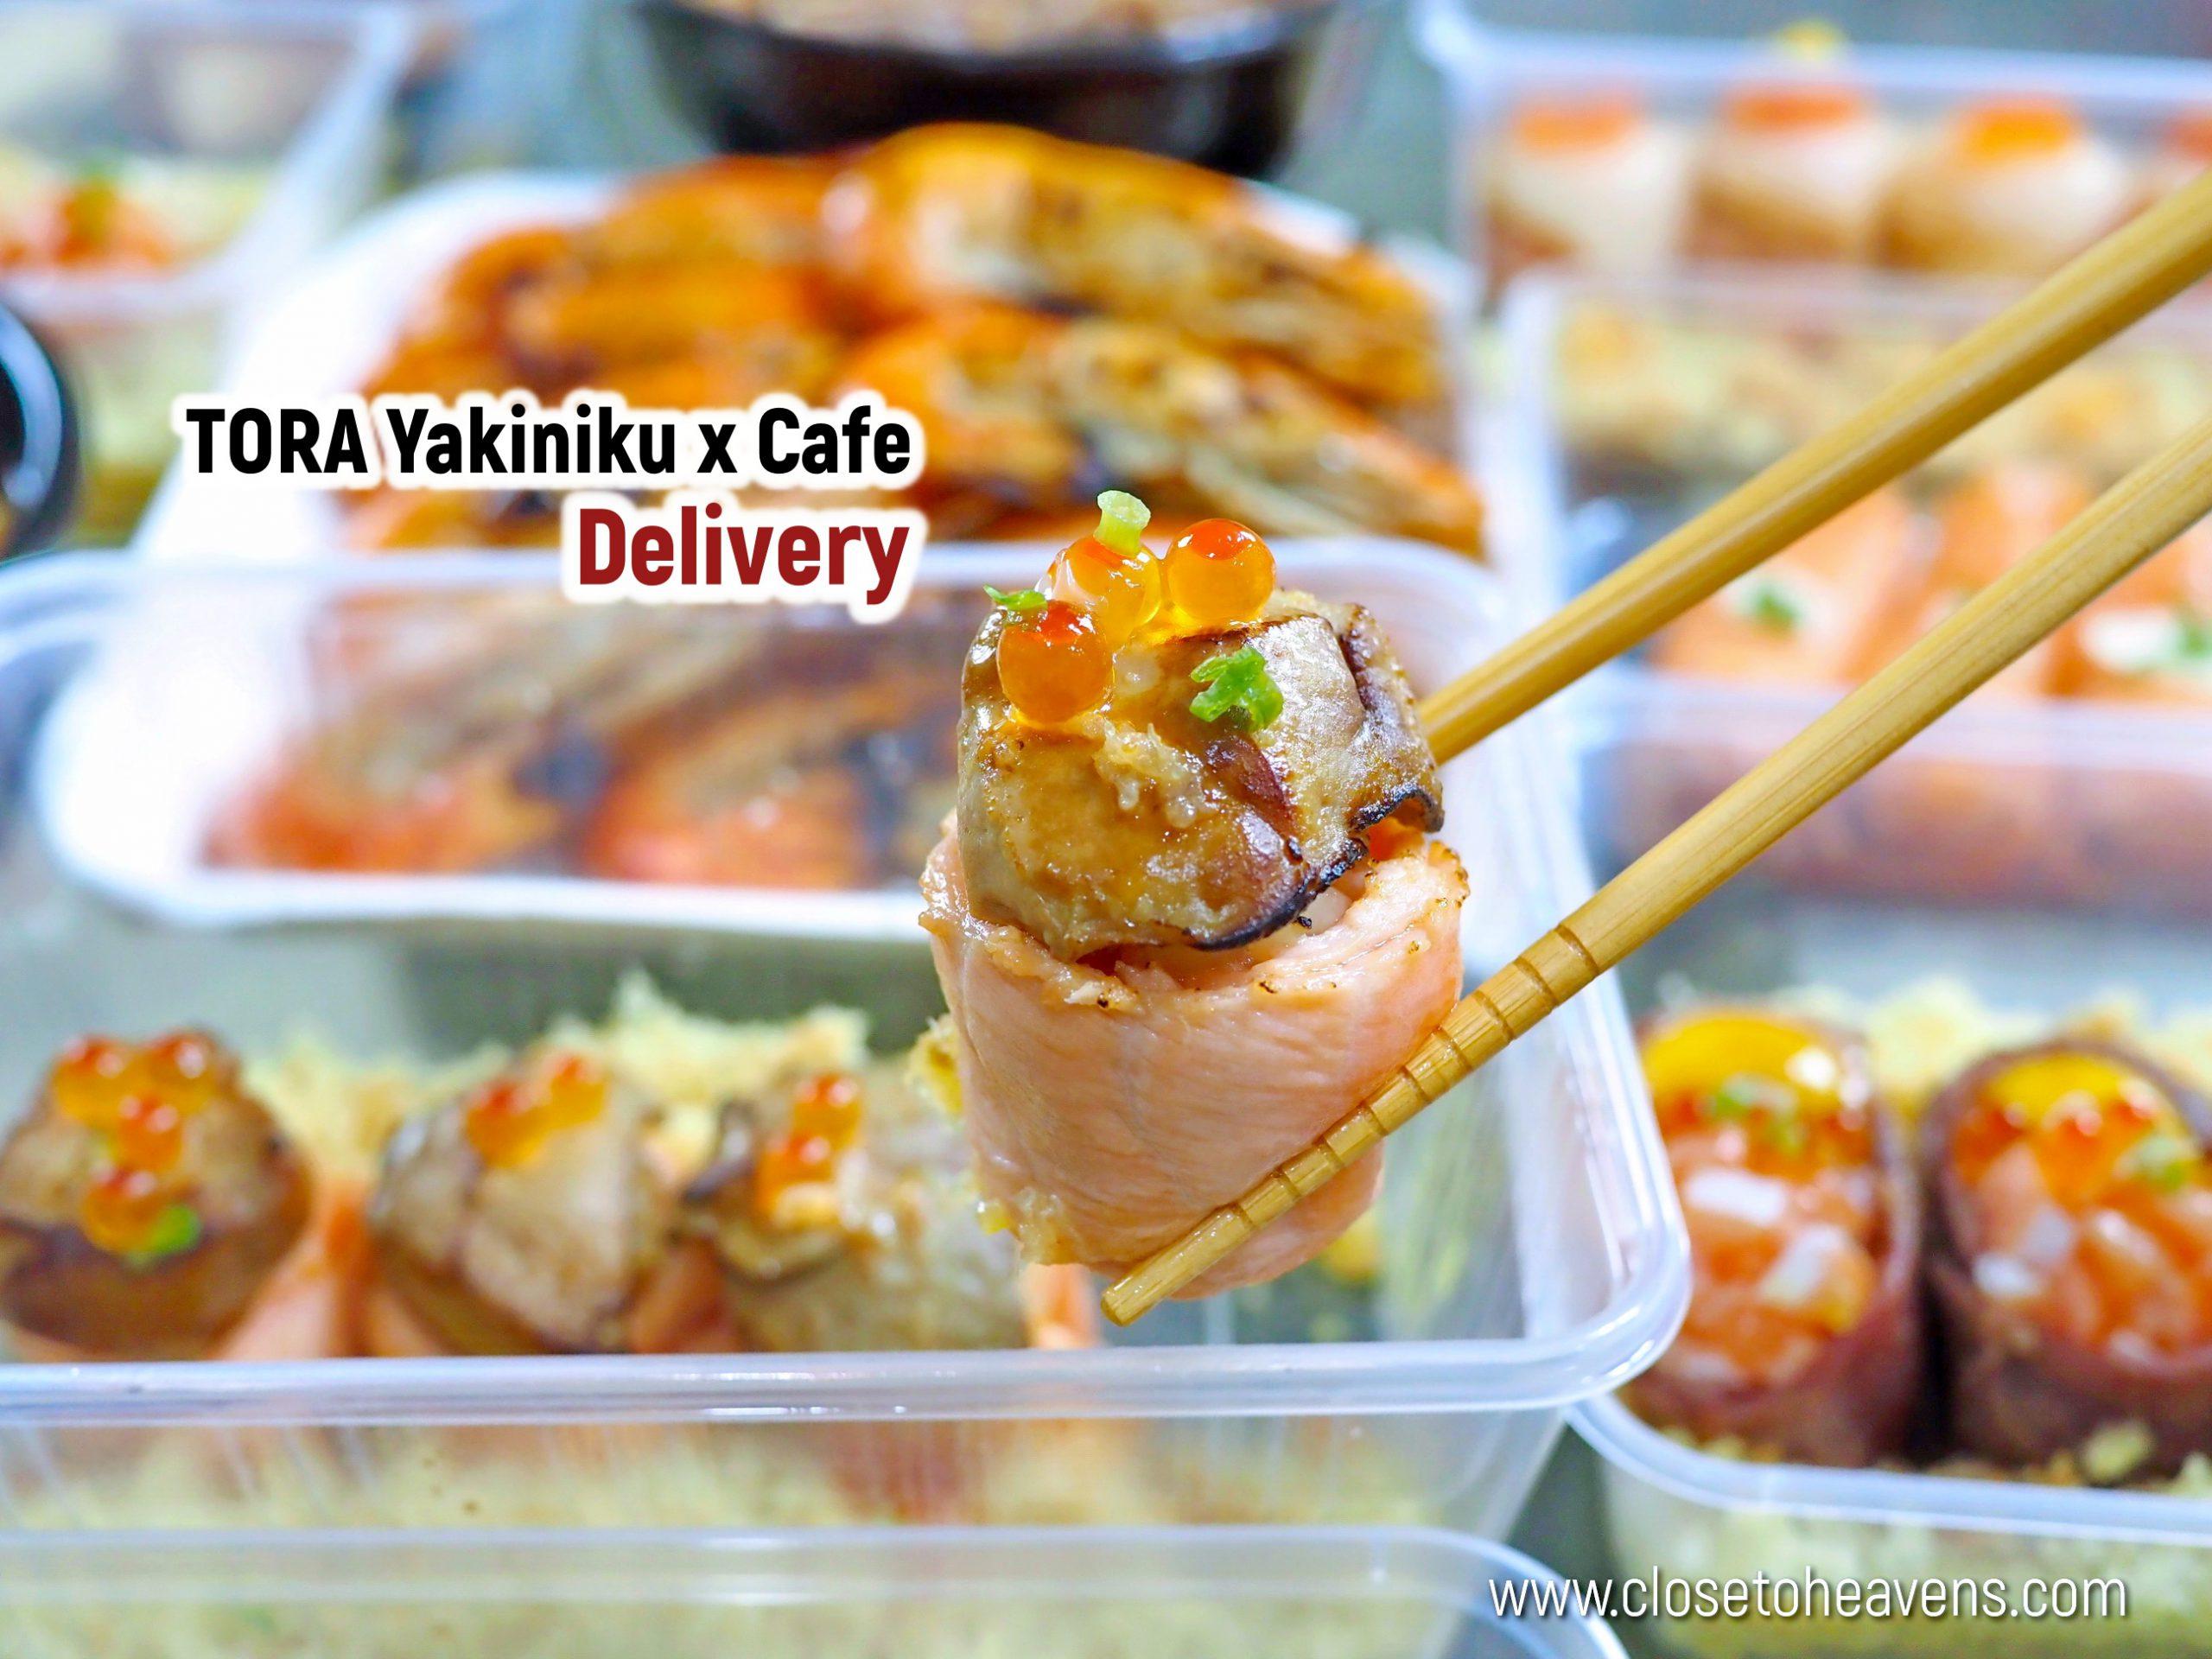 Tora Yakiniku x Cafe Food Delivery